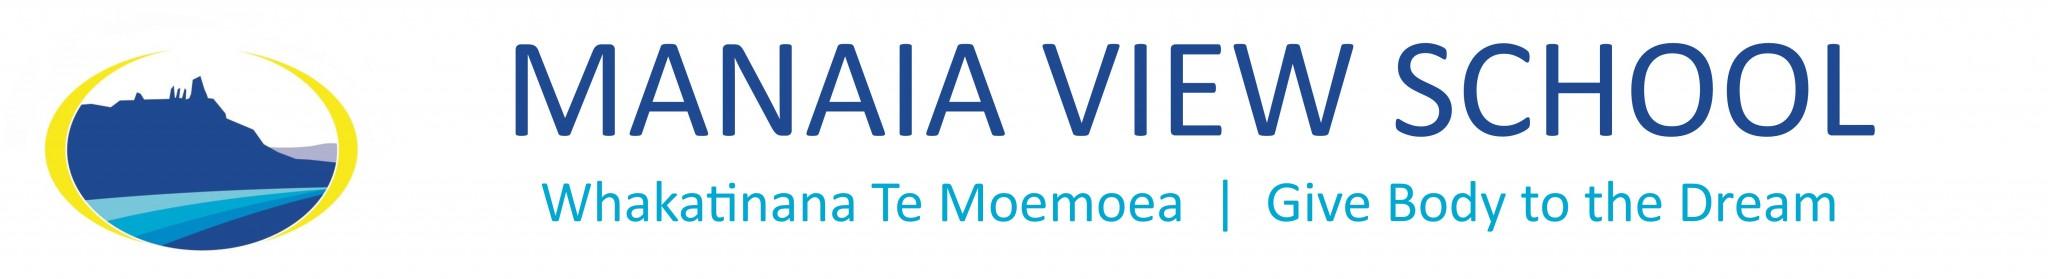 Manaia View School Logo